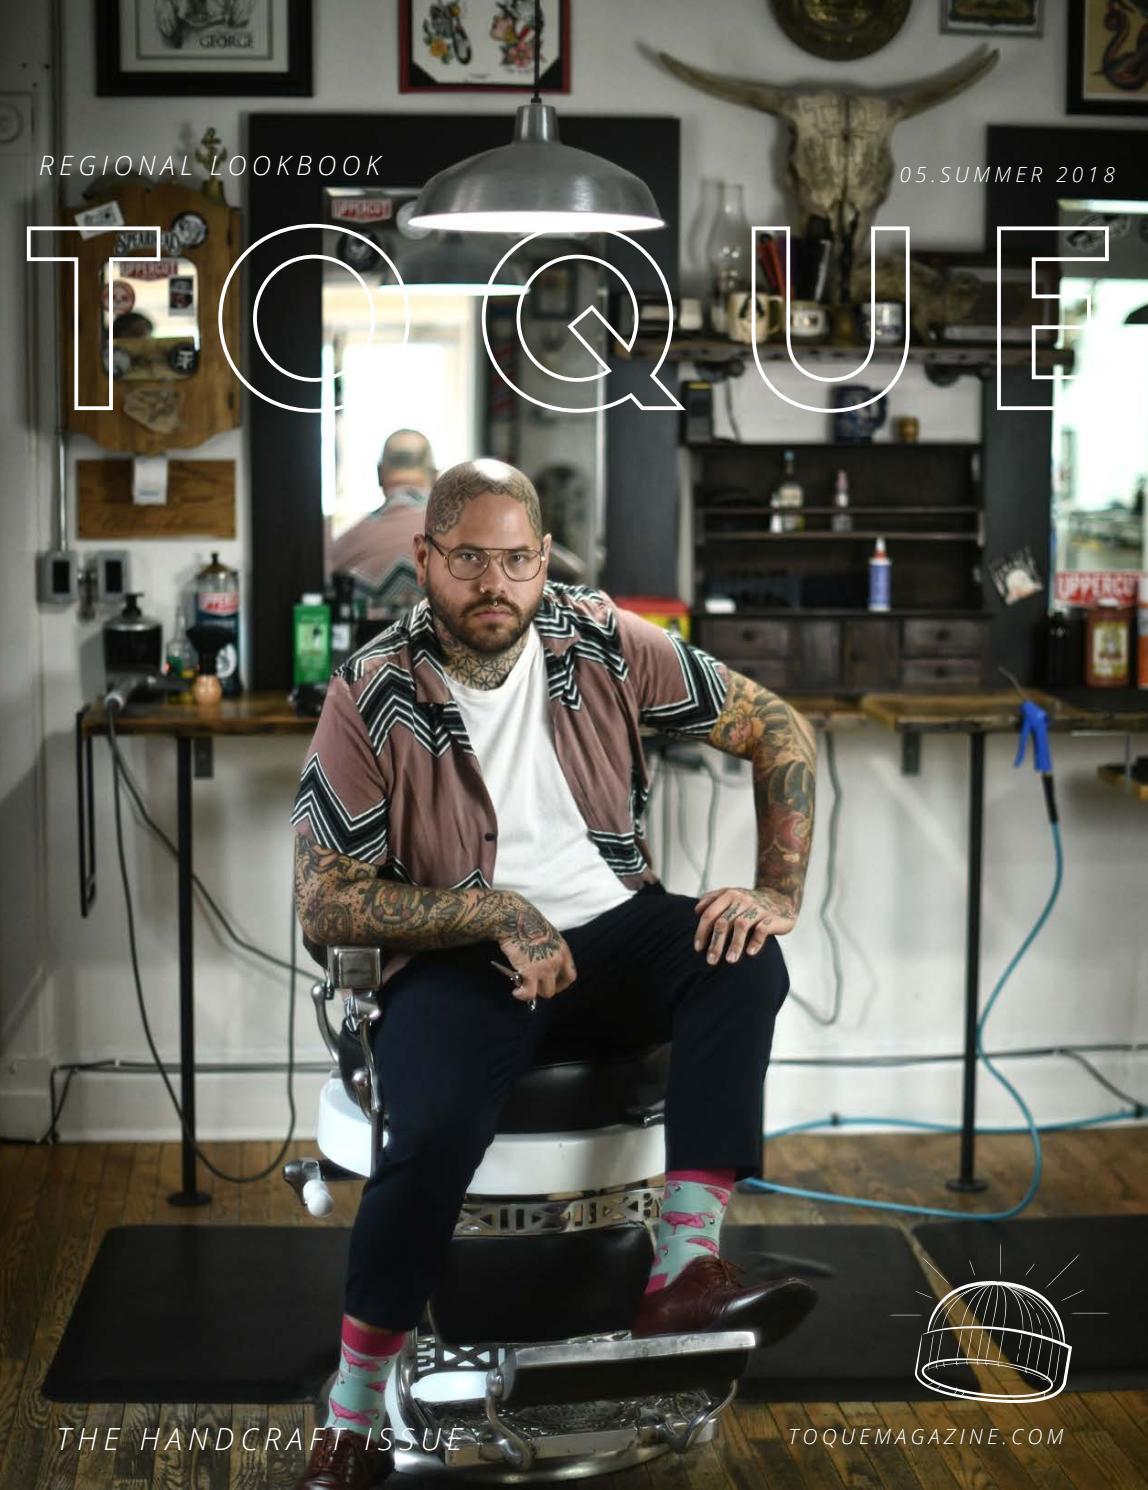 Toque Magazine Issue 5 The Handcraft Issue By Toque